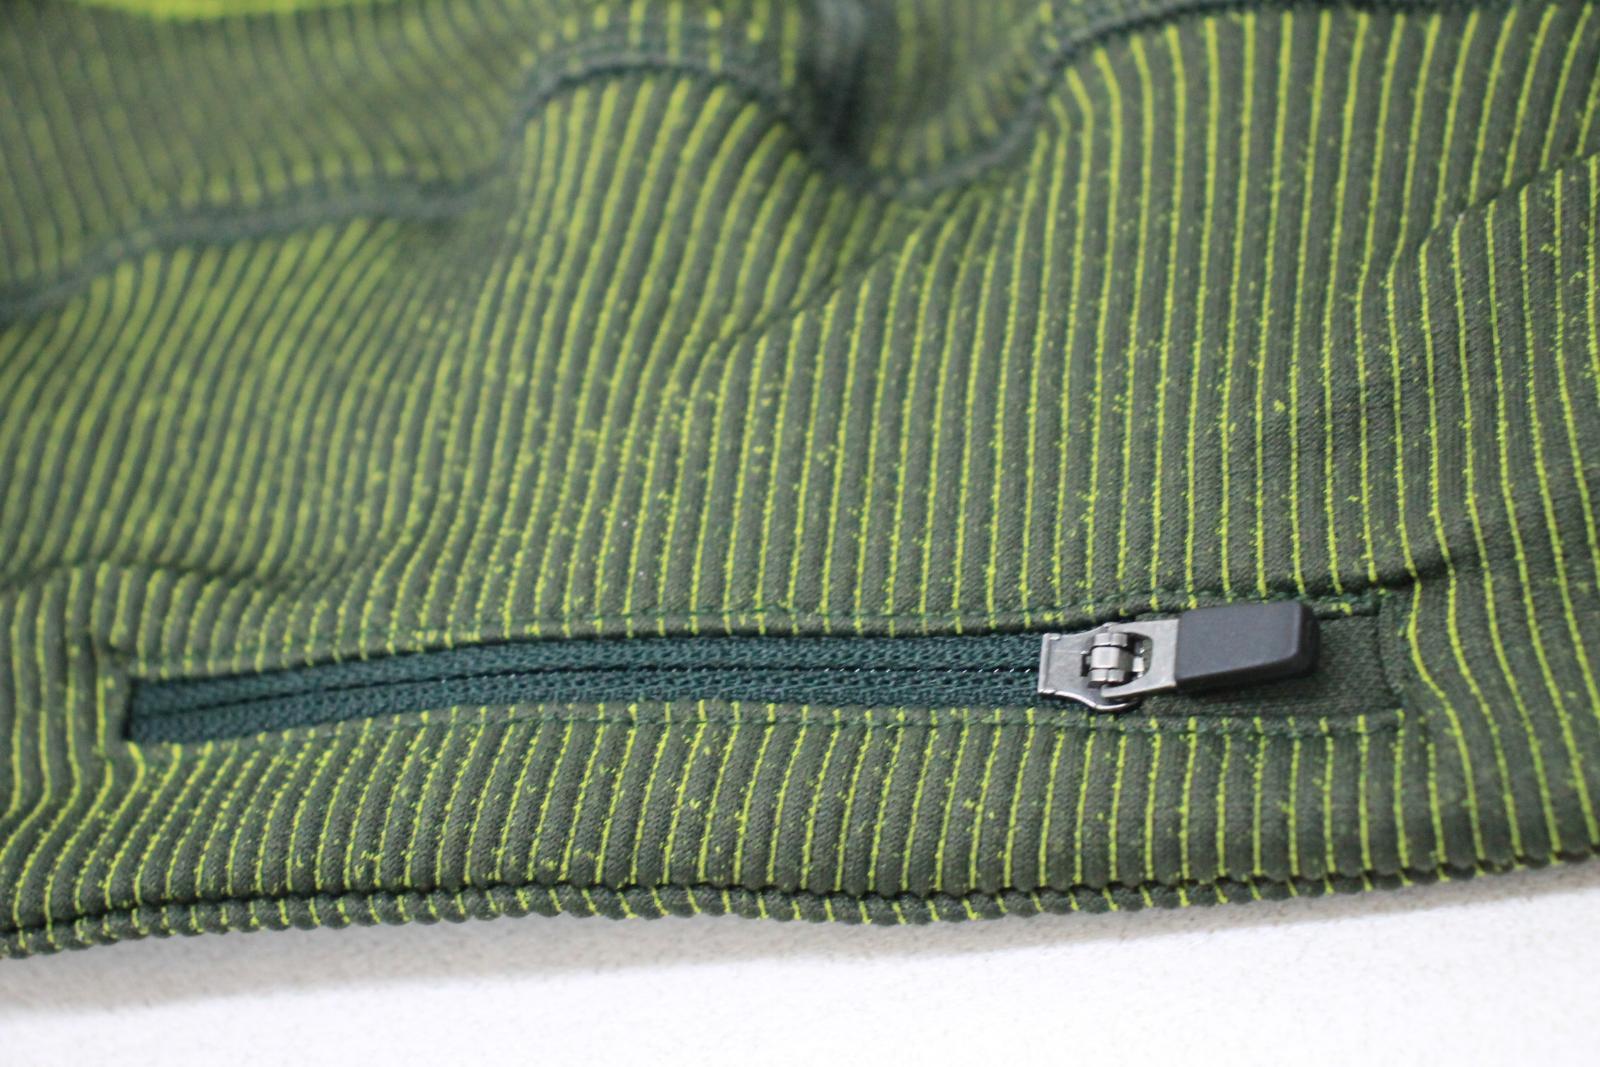 Sweaty-Betty-senoras-Neon-Verde-Amarillo-Elastico-Cintura-Alta-Leggings-S-W24-L24 miniatura 9